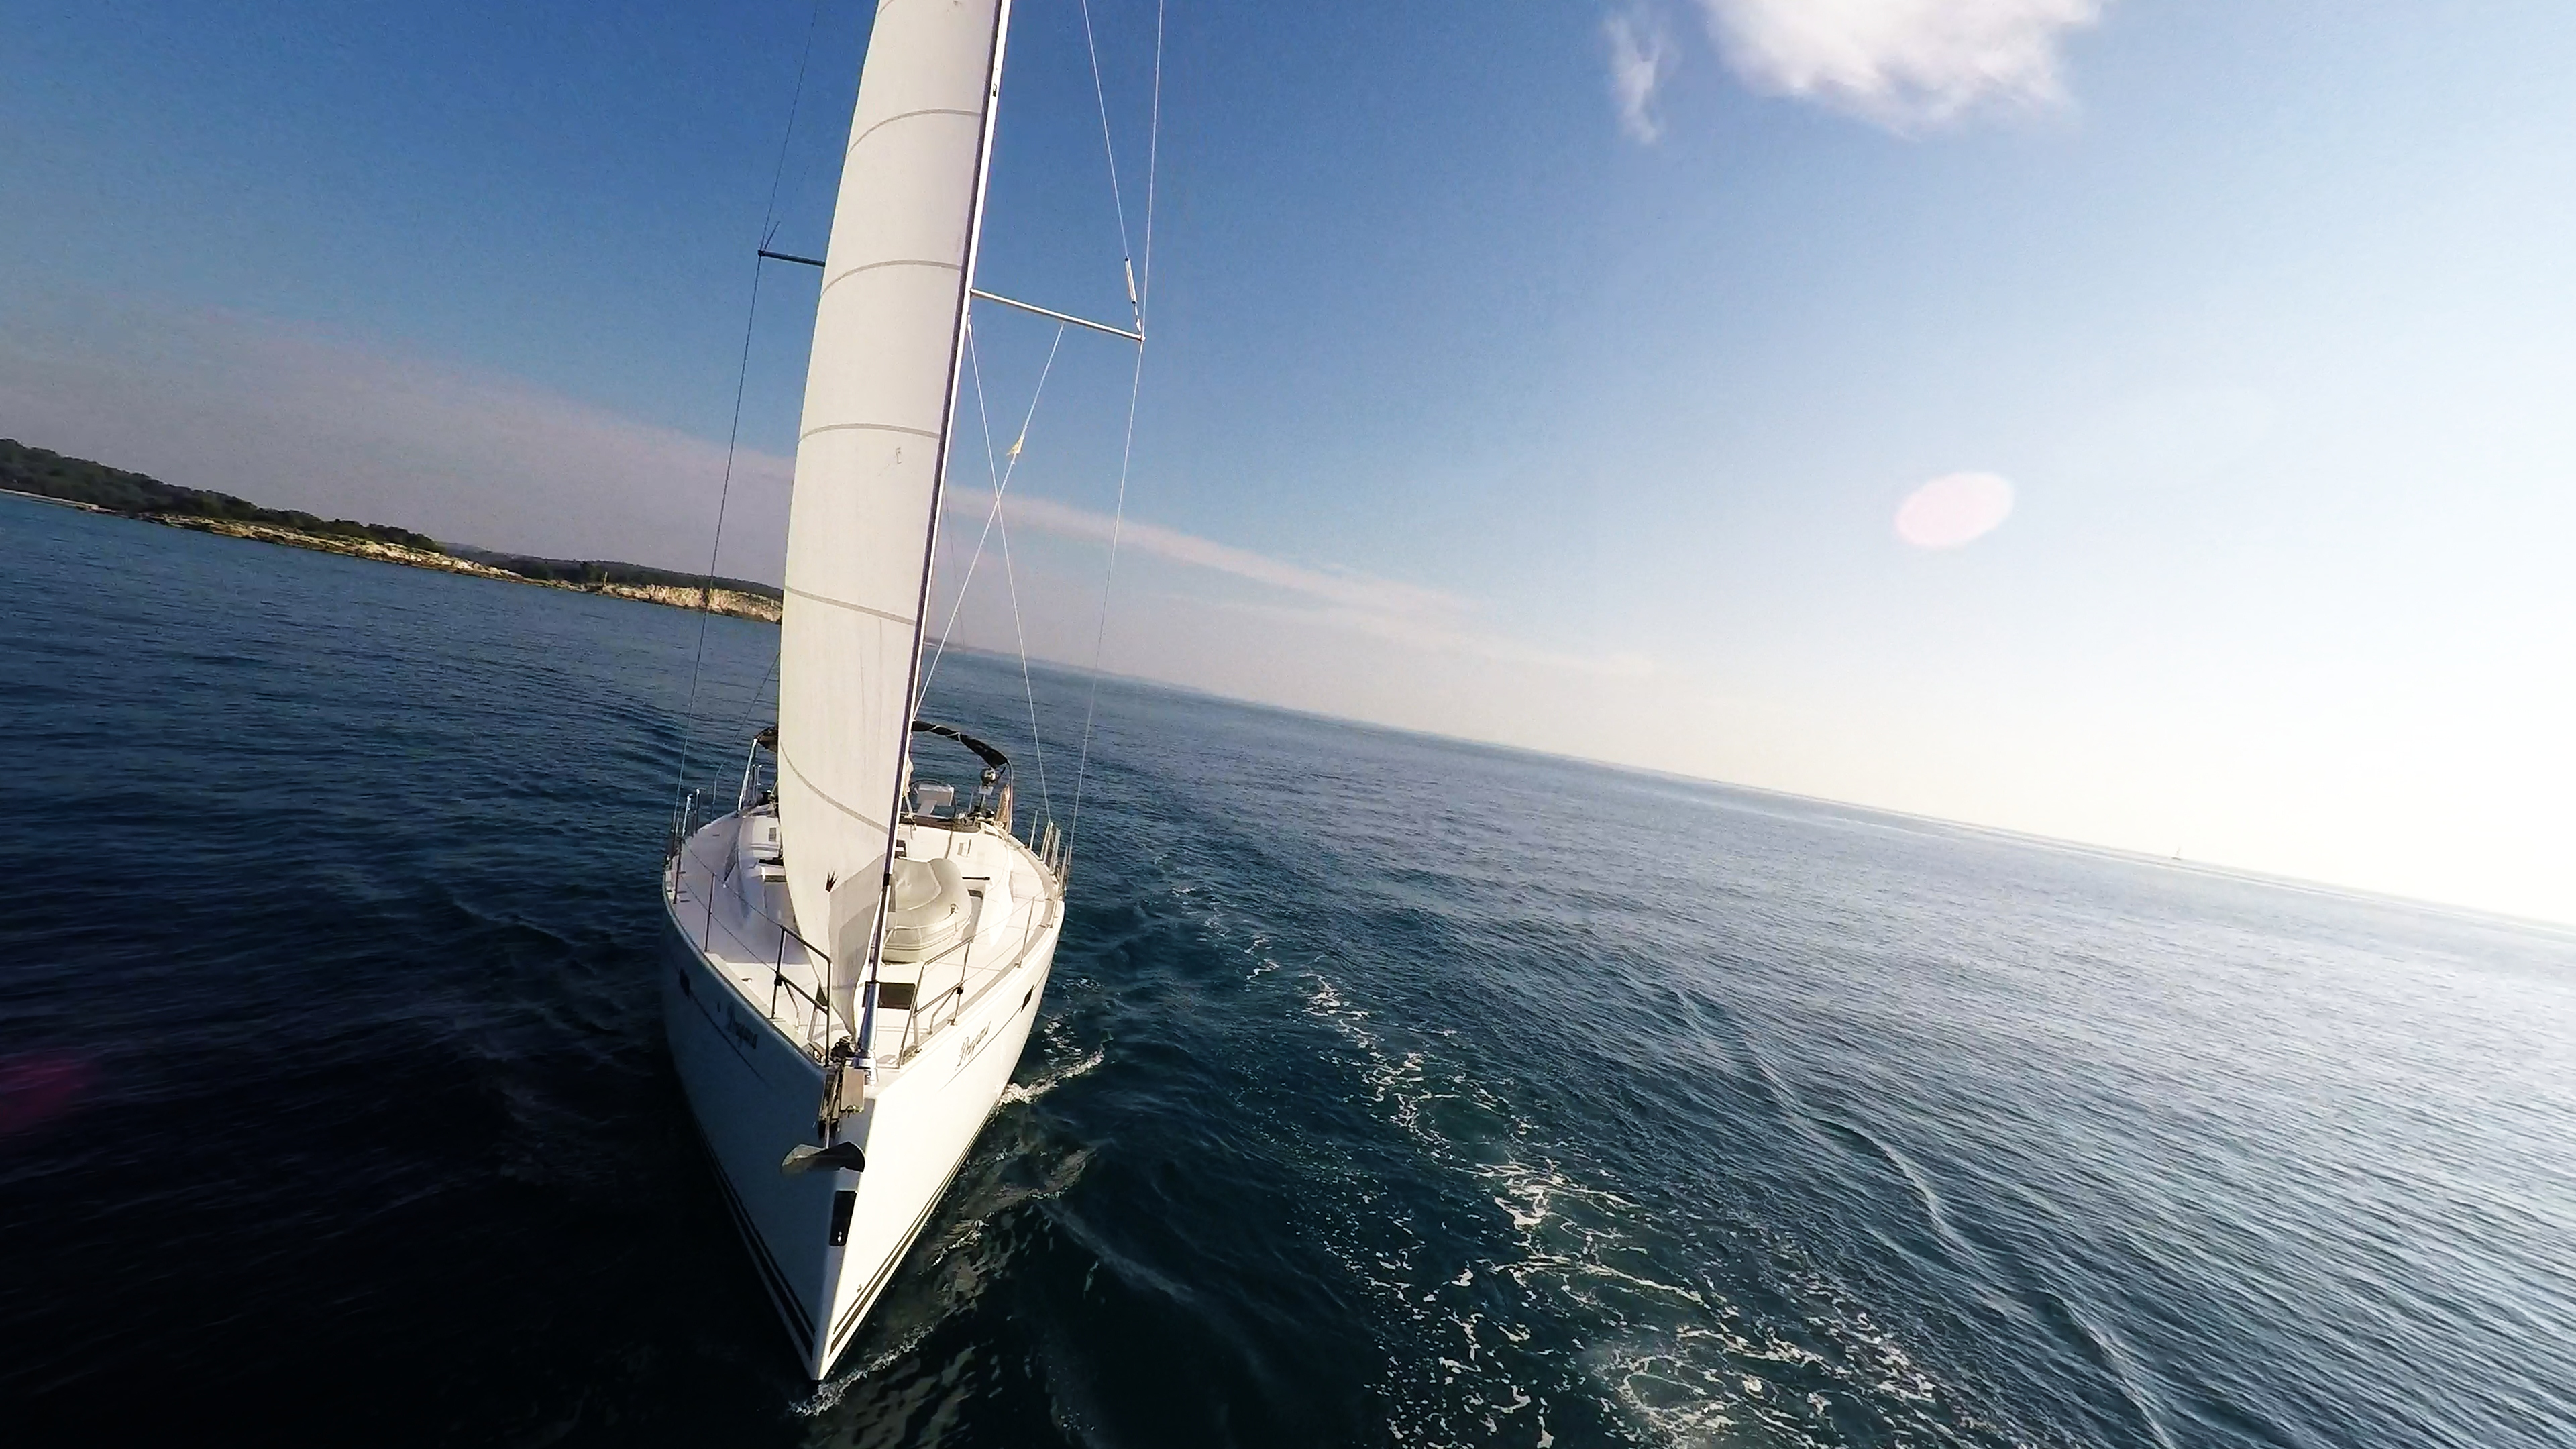 barcha a vela prua barca a vela veleggiare vele cielo blu mare